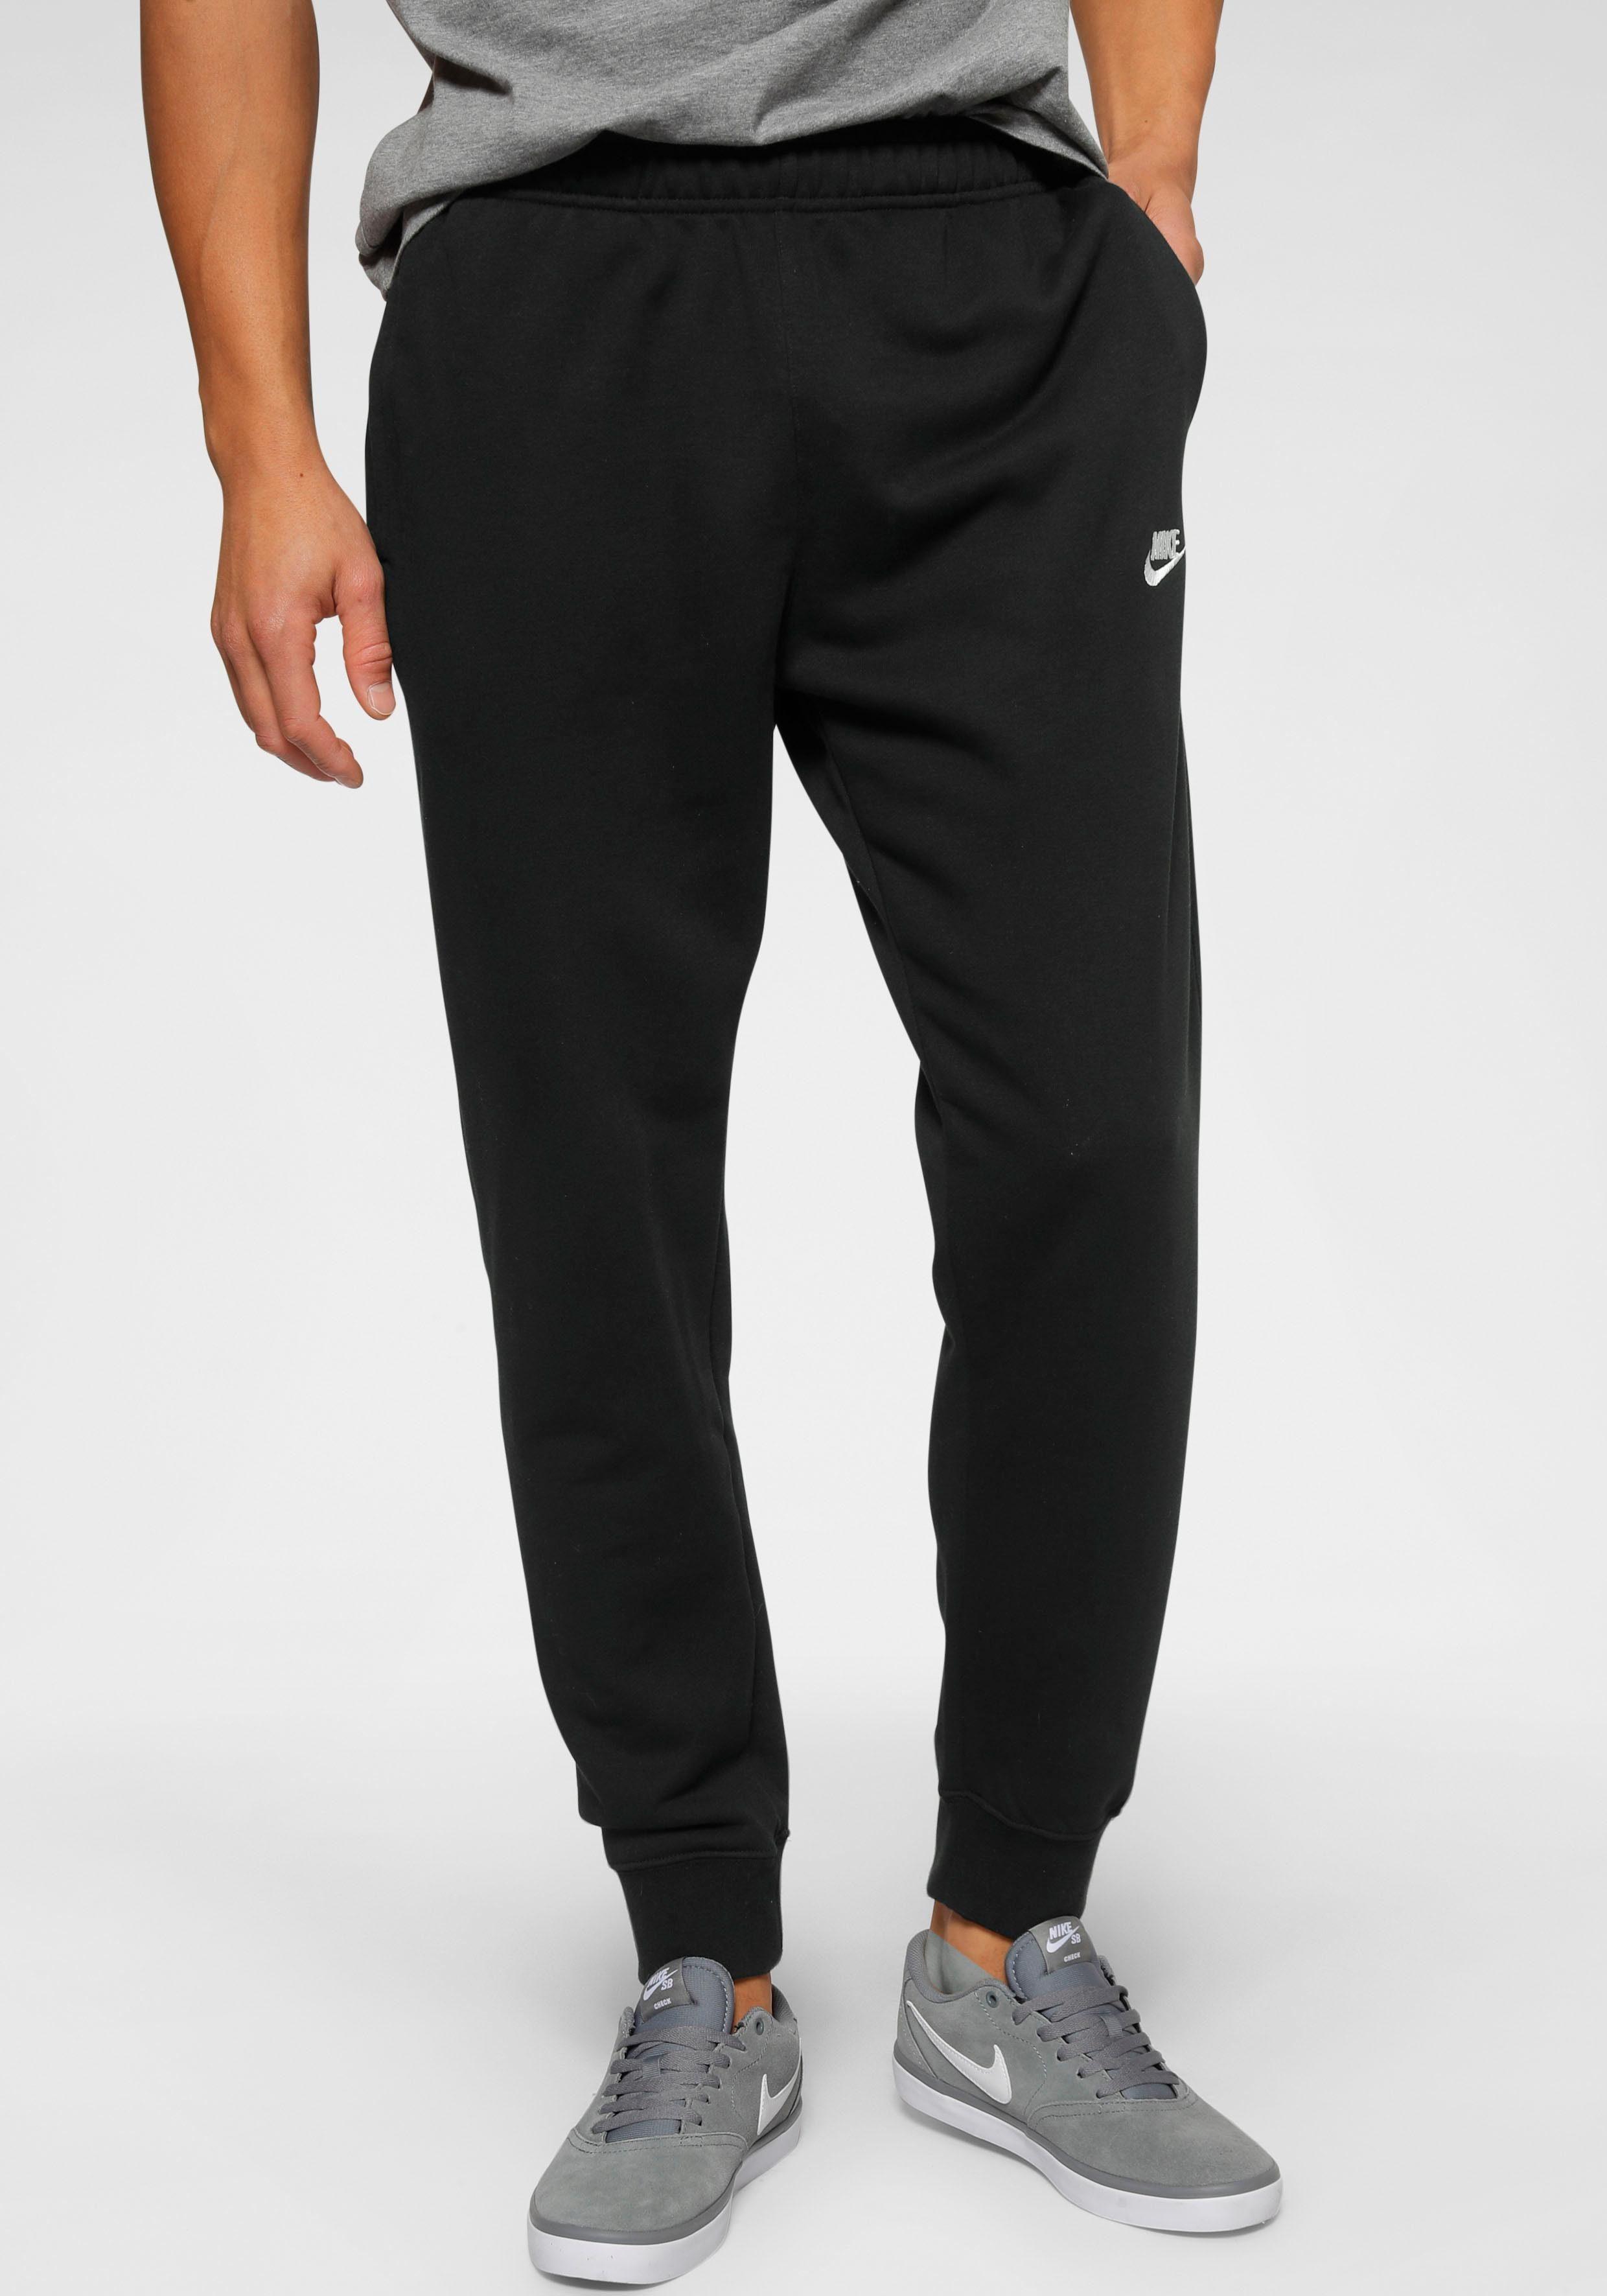 Nike Sportswear Jogginghose M NSW CLUB JOGGER FT | Sportbekleidung > Sporthosen > Sonstige Sporthosen | Schwarz | Nike Sportswear